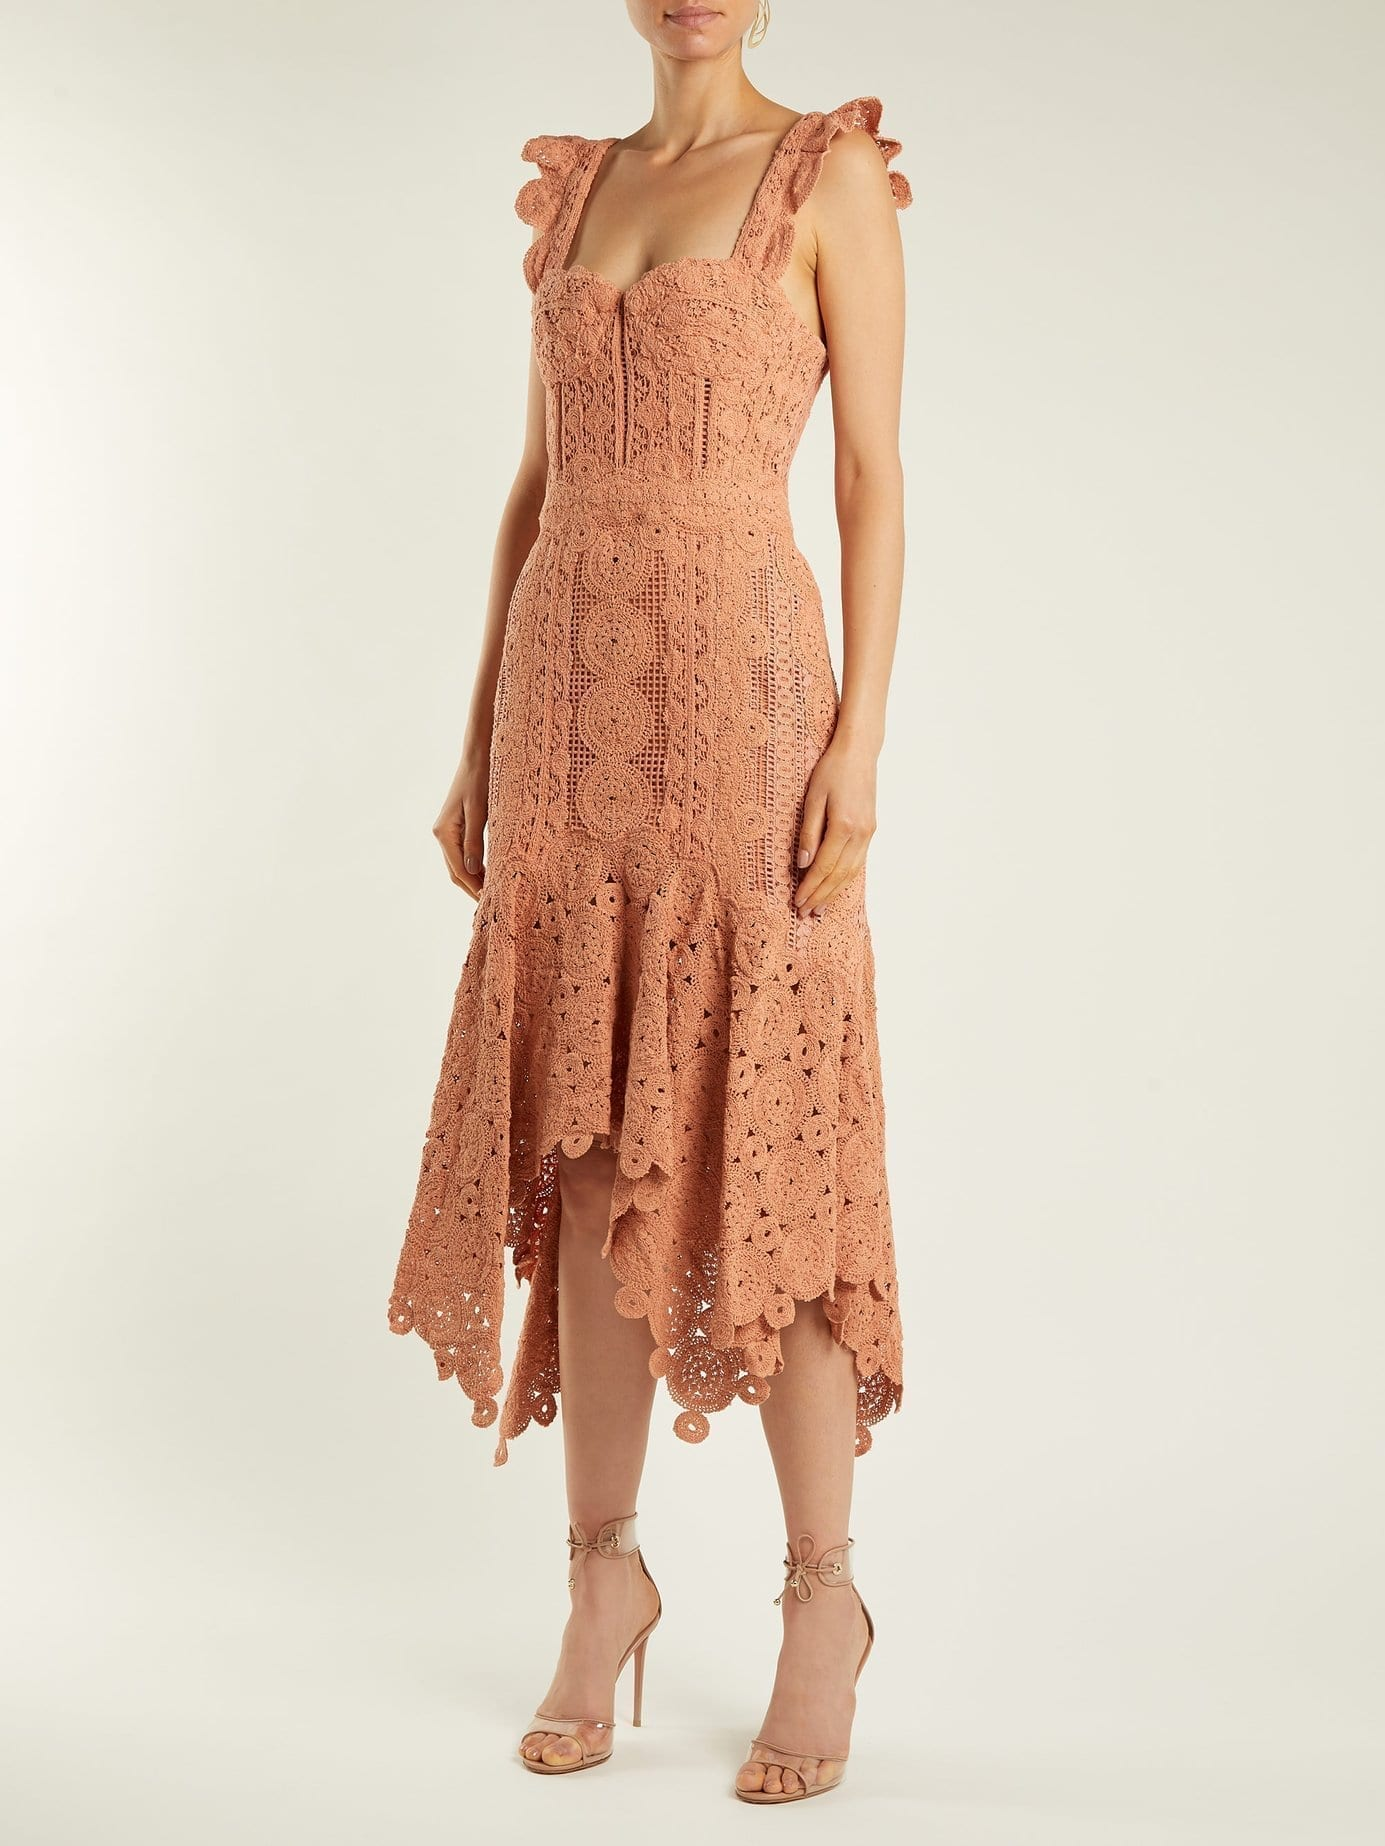 JONATHAN SIMKHAI Cotton-Macramé Lace Handkerchief-Hem Coral-Peach Dress